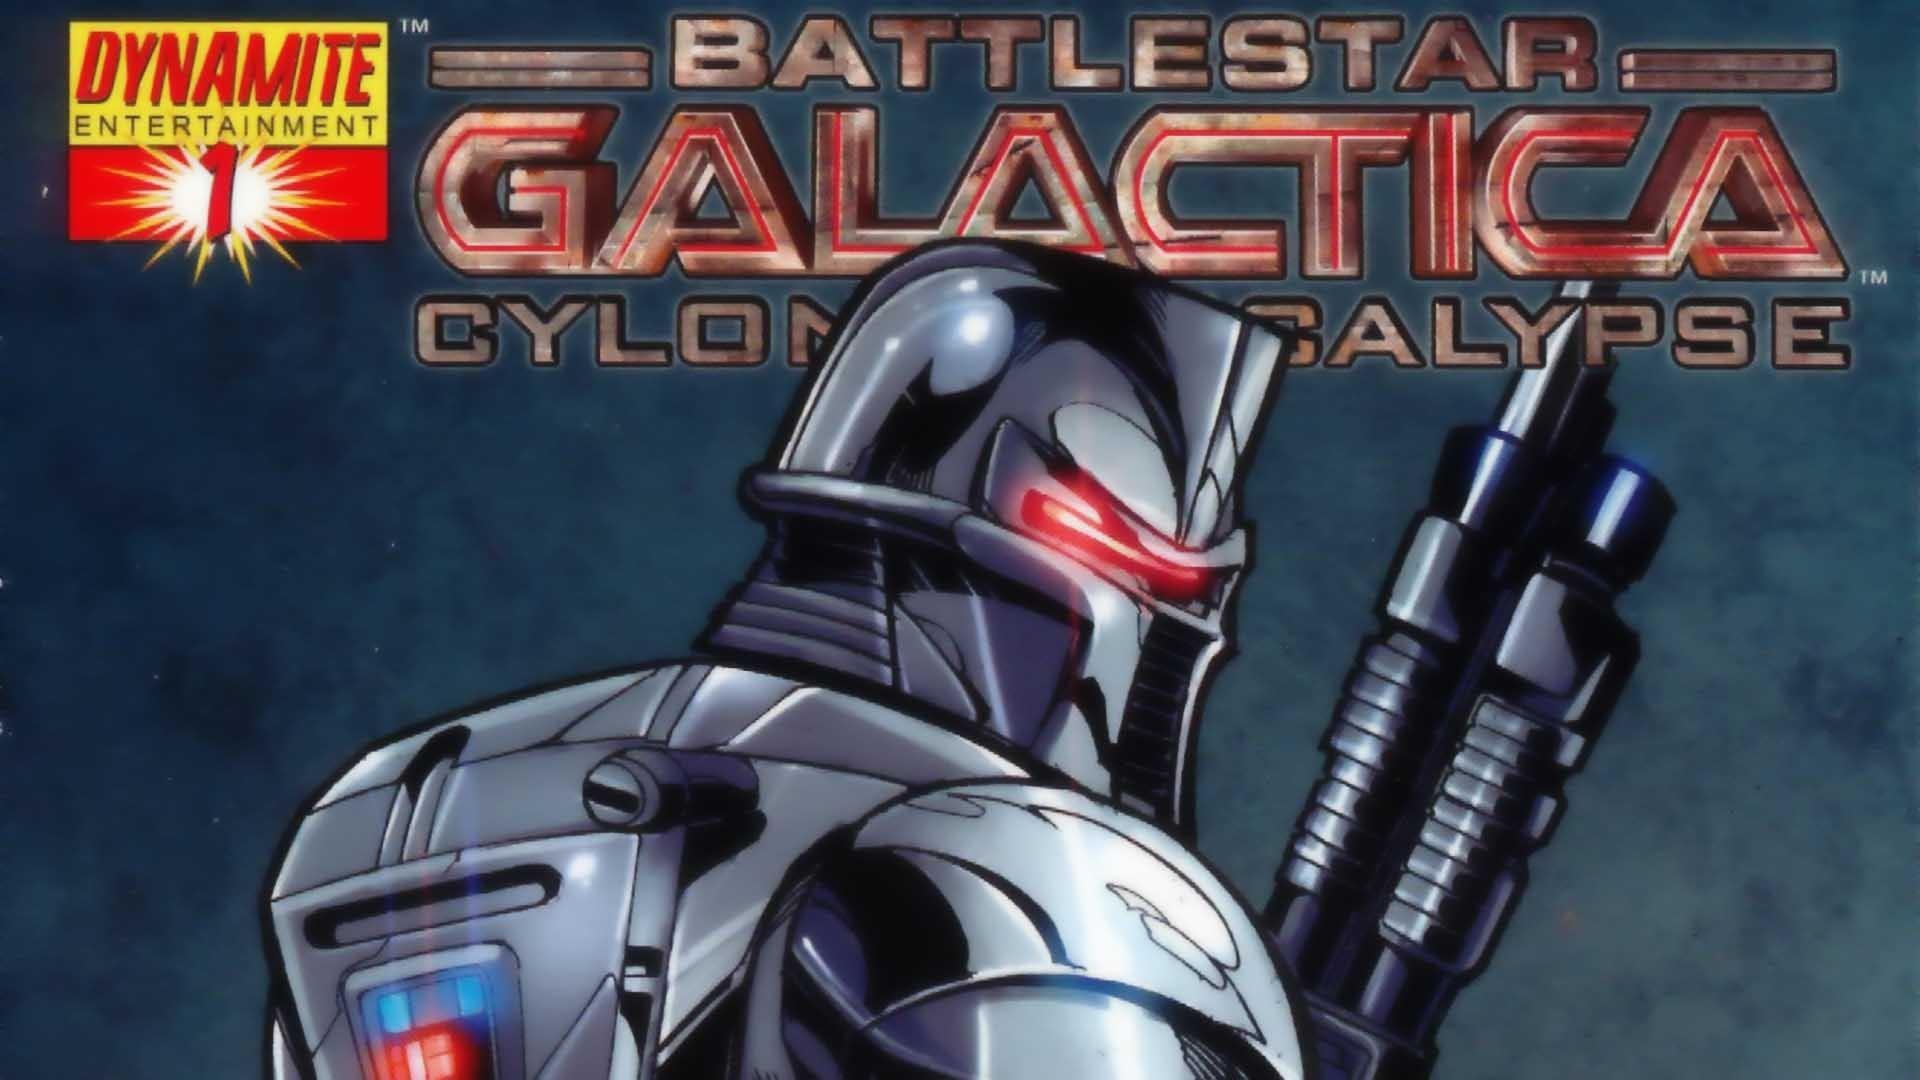 free screensaver wallpapers for battlestar galactica